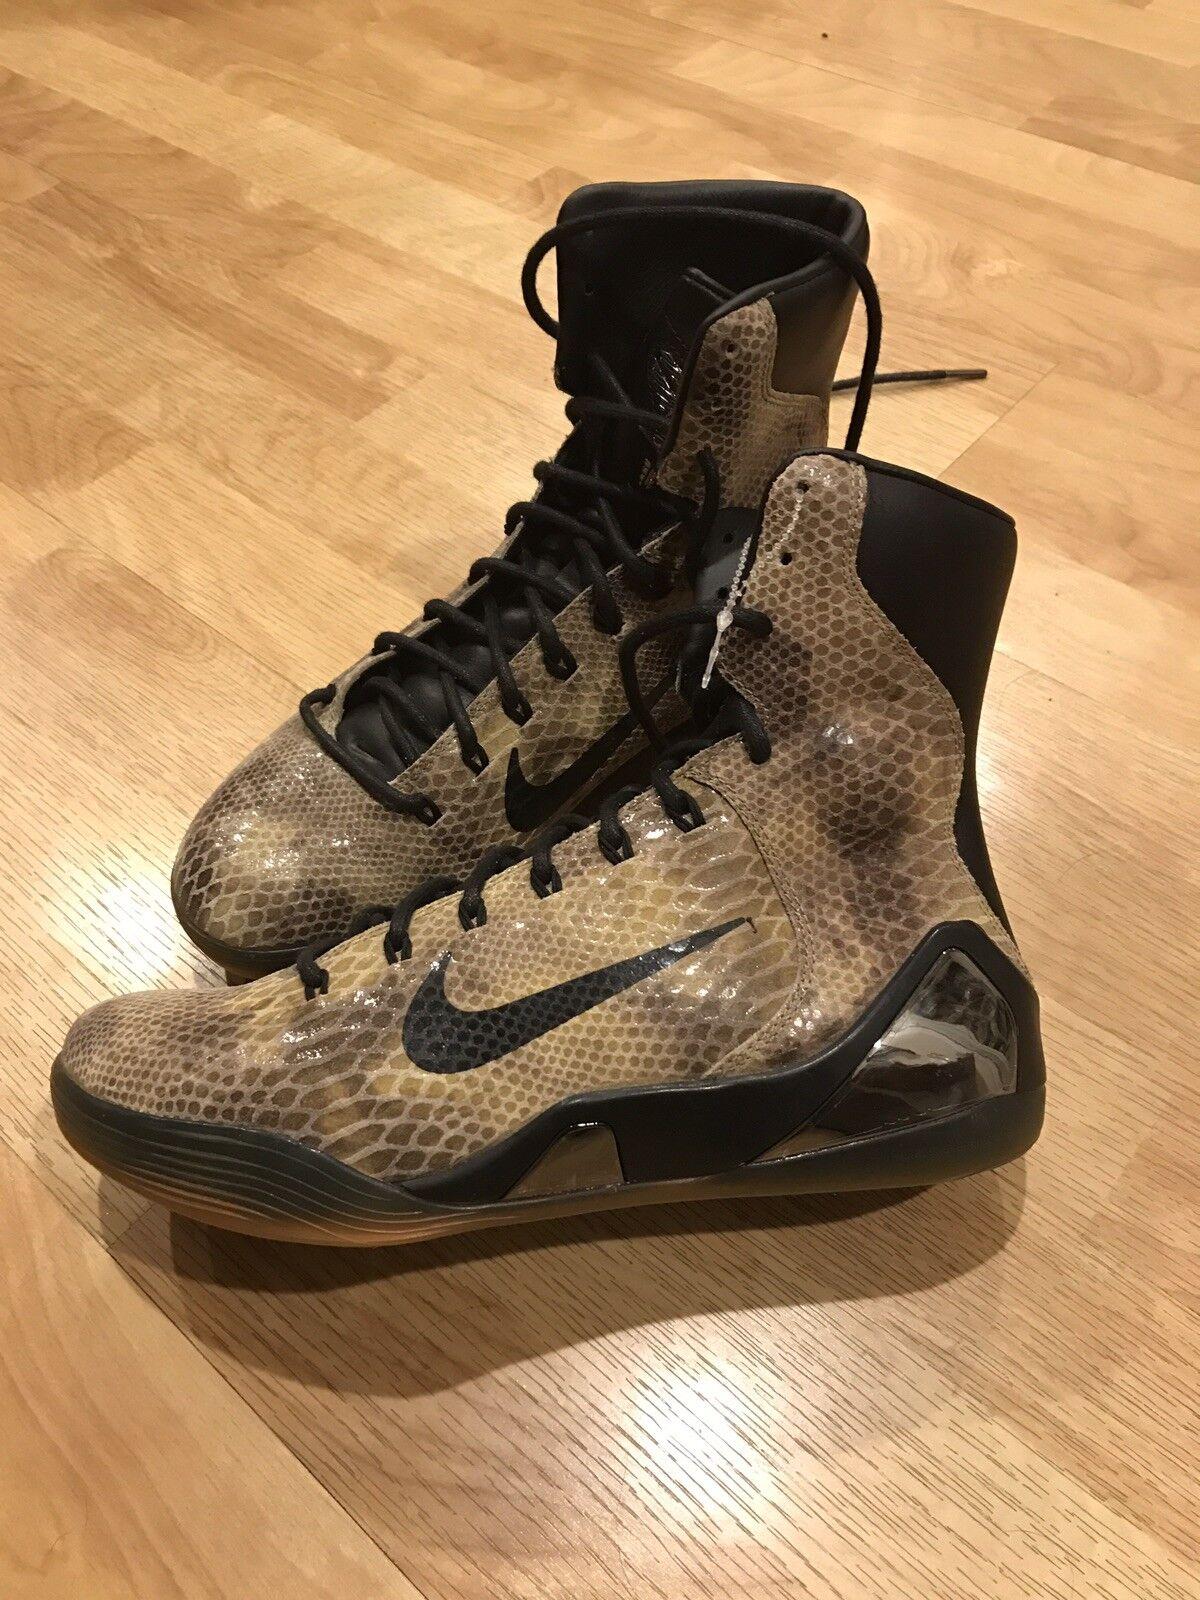 Nike Kobe Men's Basketball shoes IX 9 High EXT QS Size 9.5 Snakeskin 716616-001